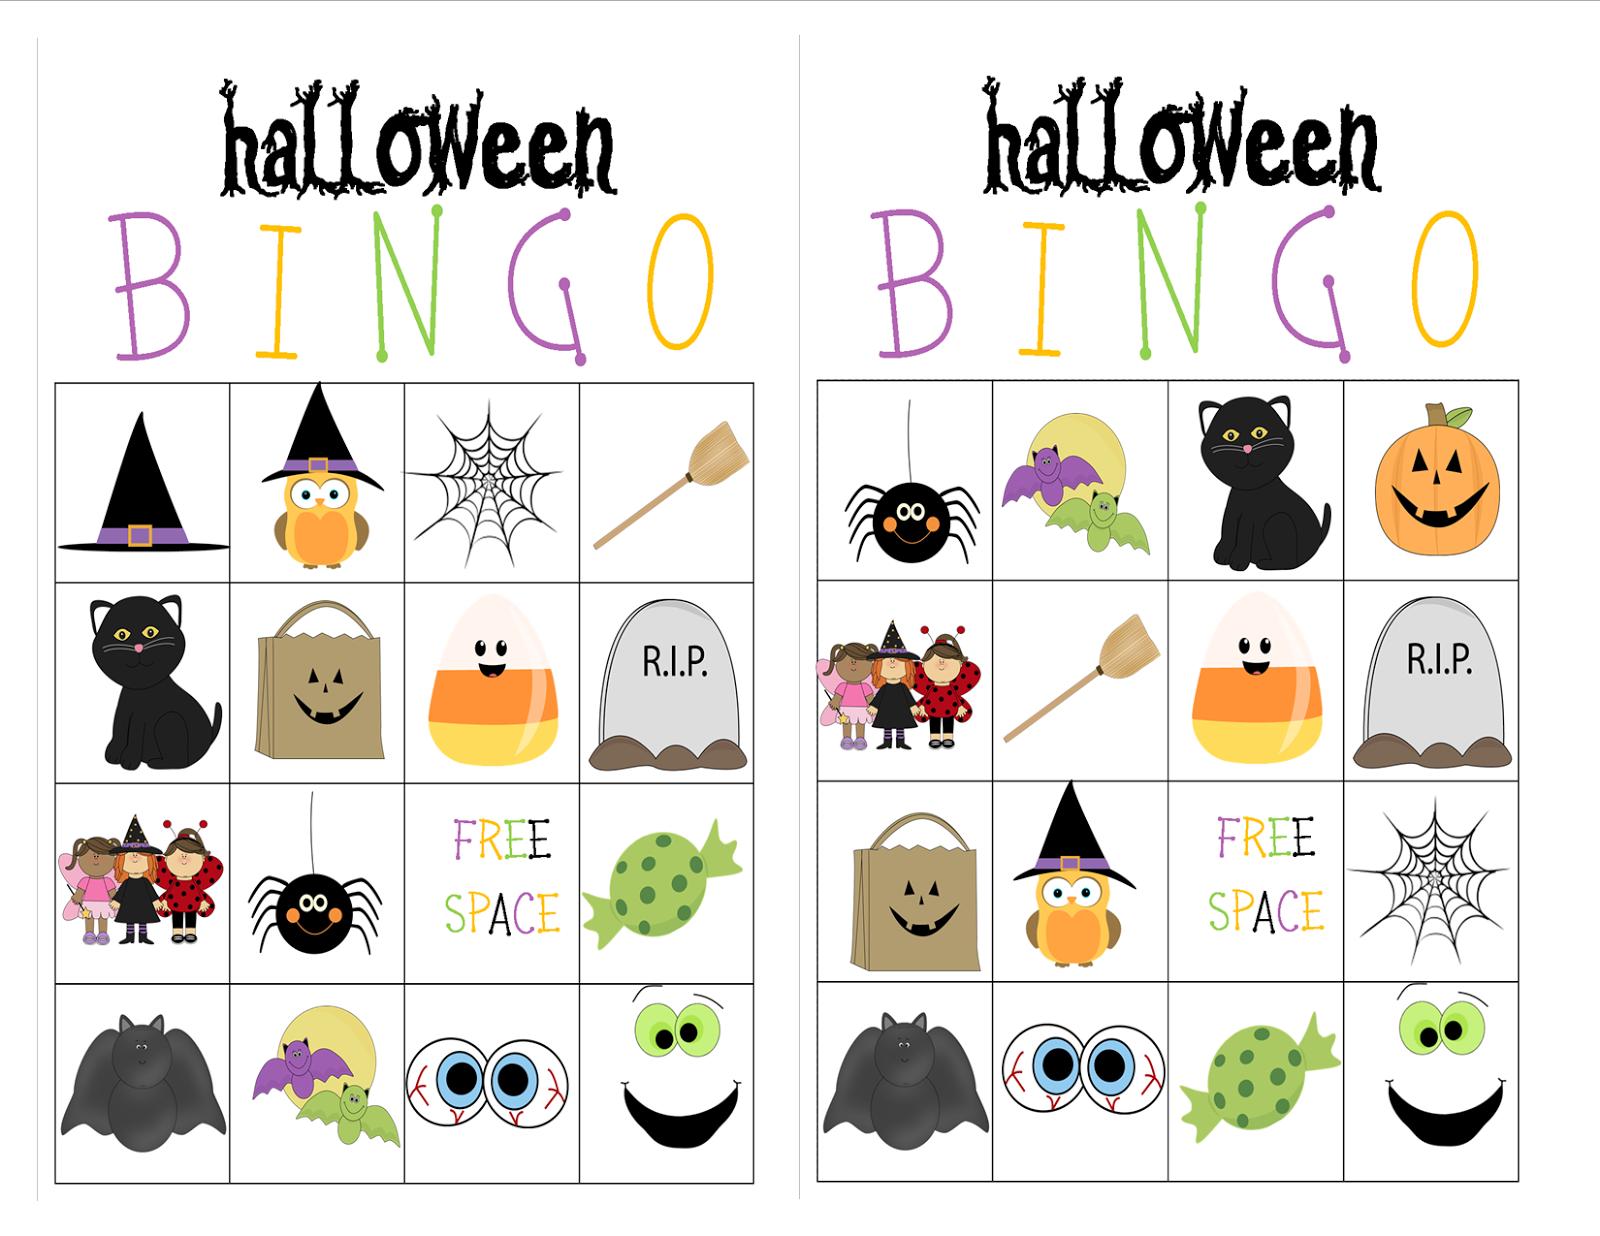 photo regarding Free Printable Halloween Bingo Cards identify 590 x 826 90 kb jpeg free of charge printable halloween bingo playing cards